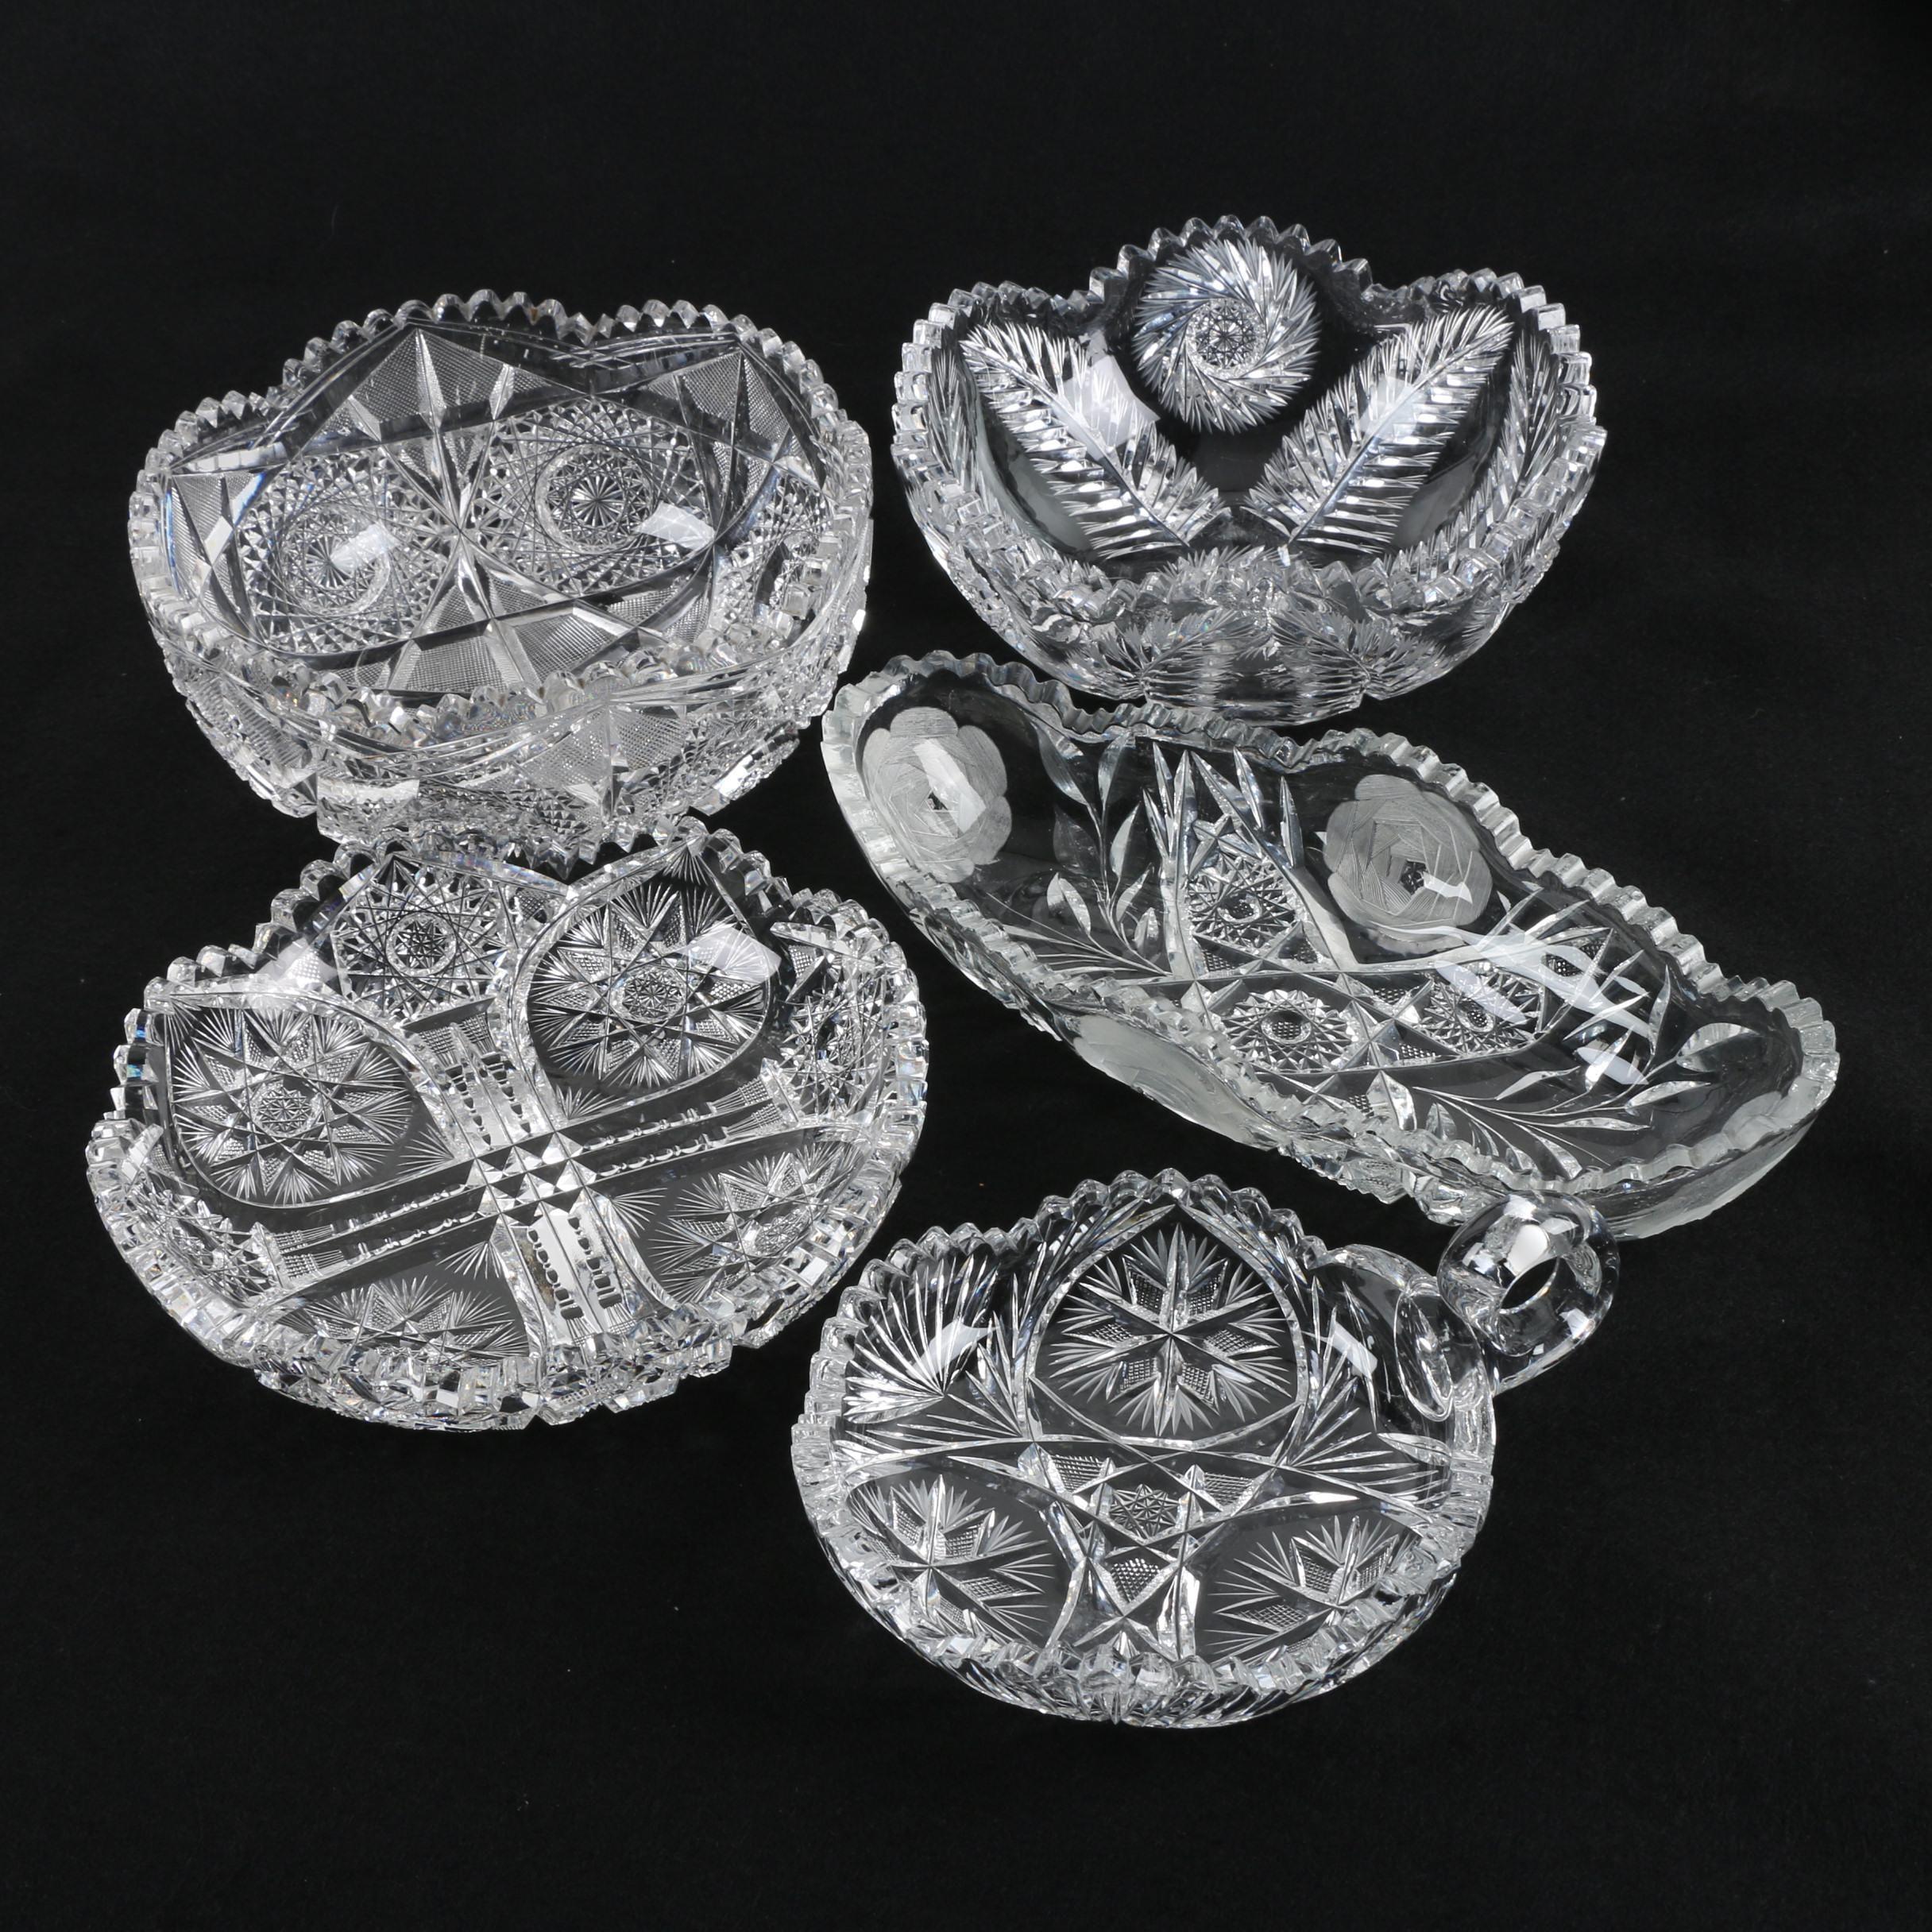 American Brilliant Period Cut Glass Bowls